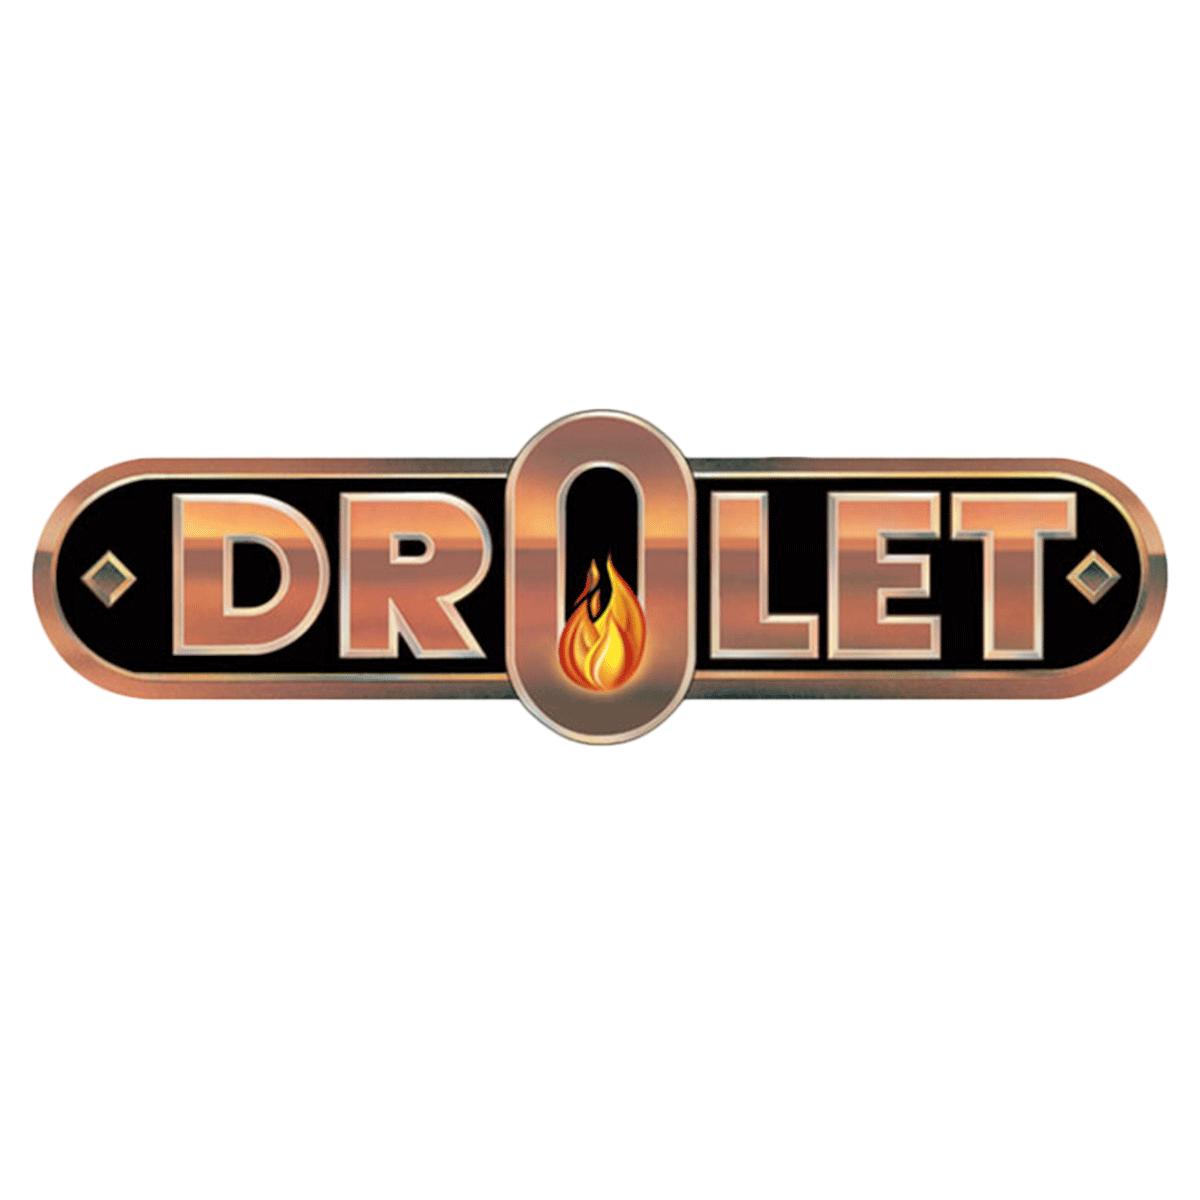 Drolet